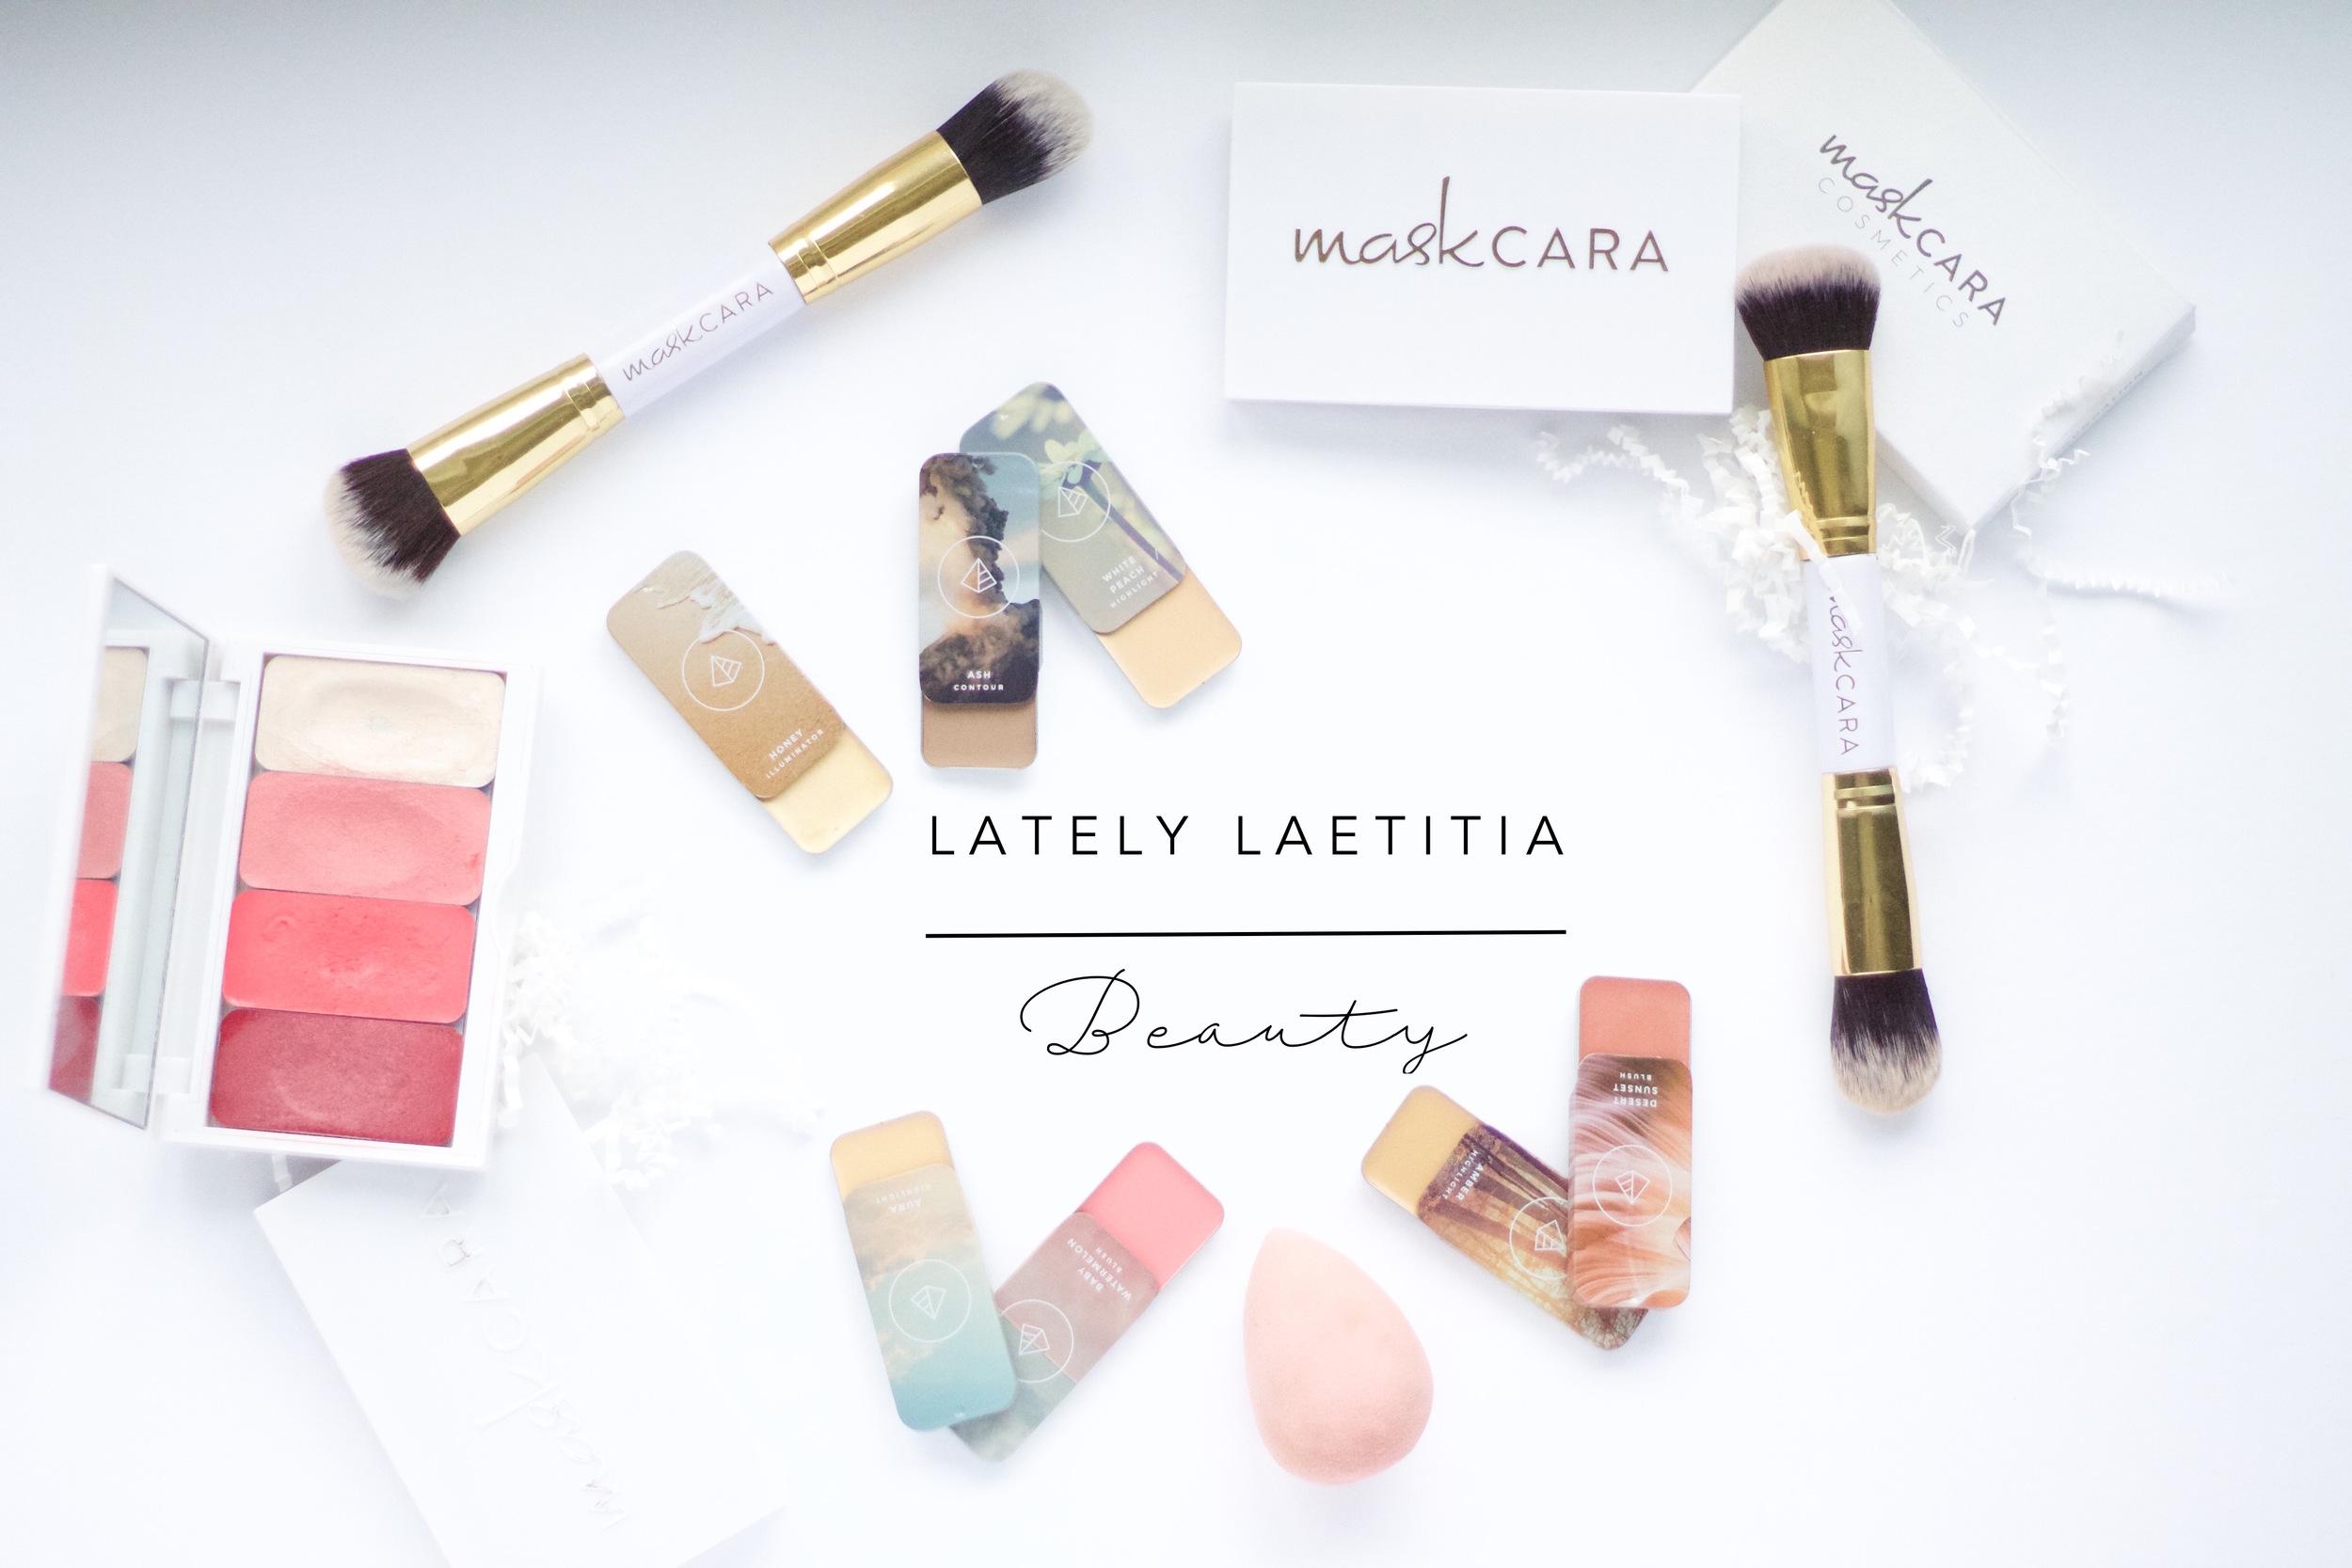 Lately Laetitia Beauty